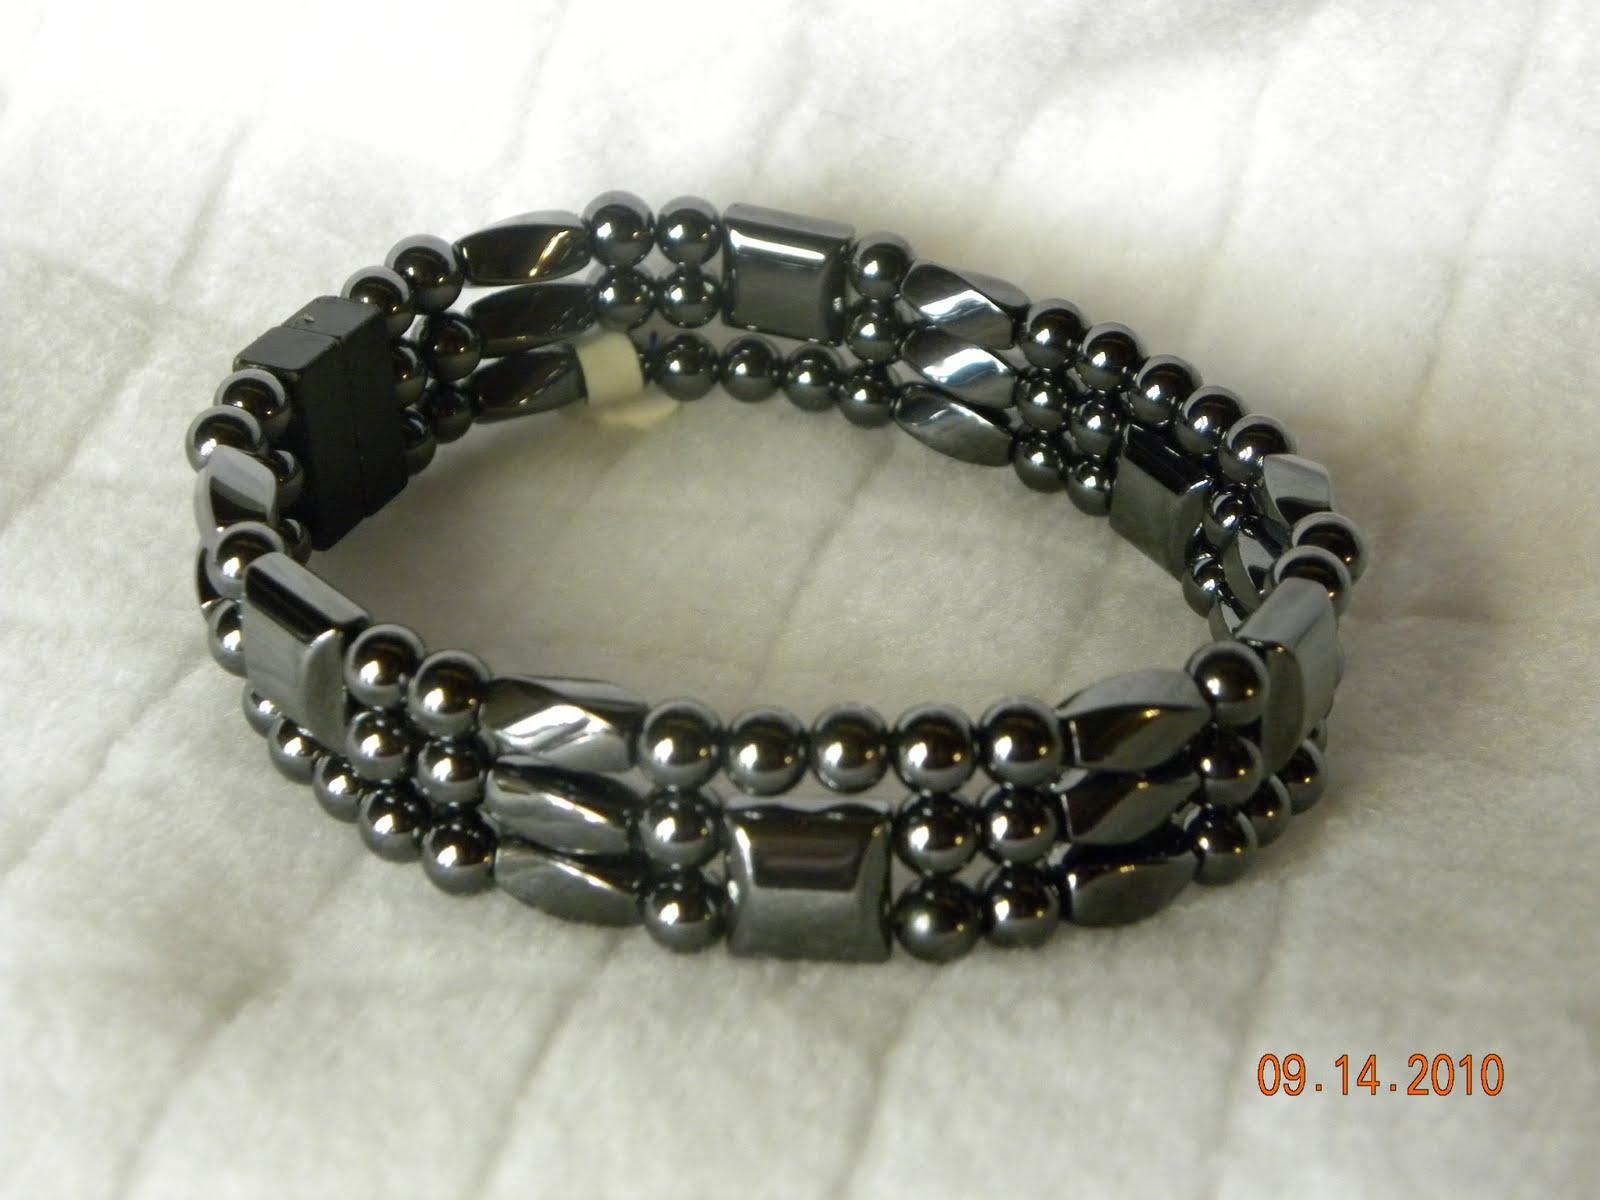 Kern S Magnetic Jewelry